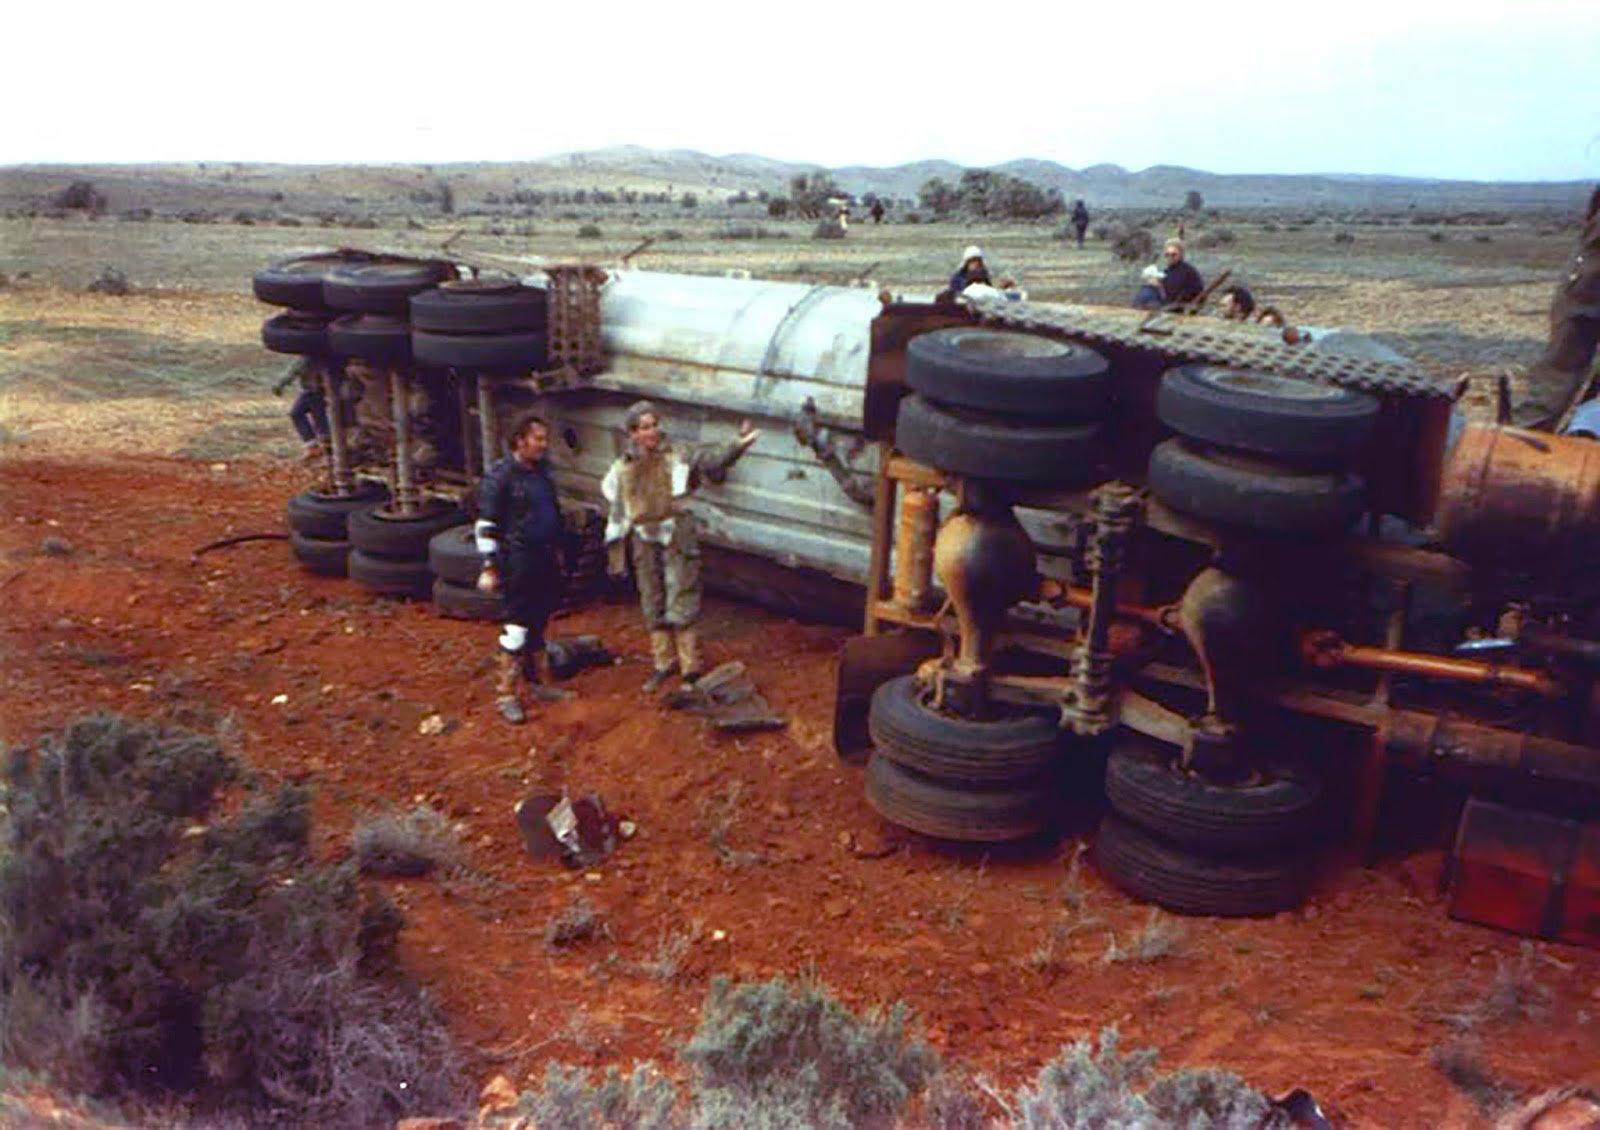 Dennis Williams (left) surveys the wreckage